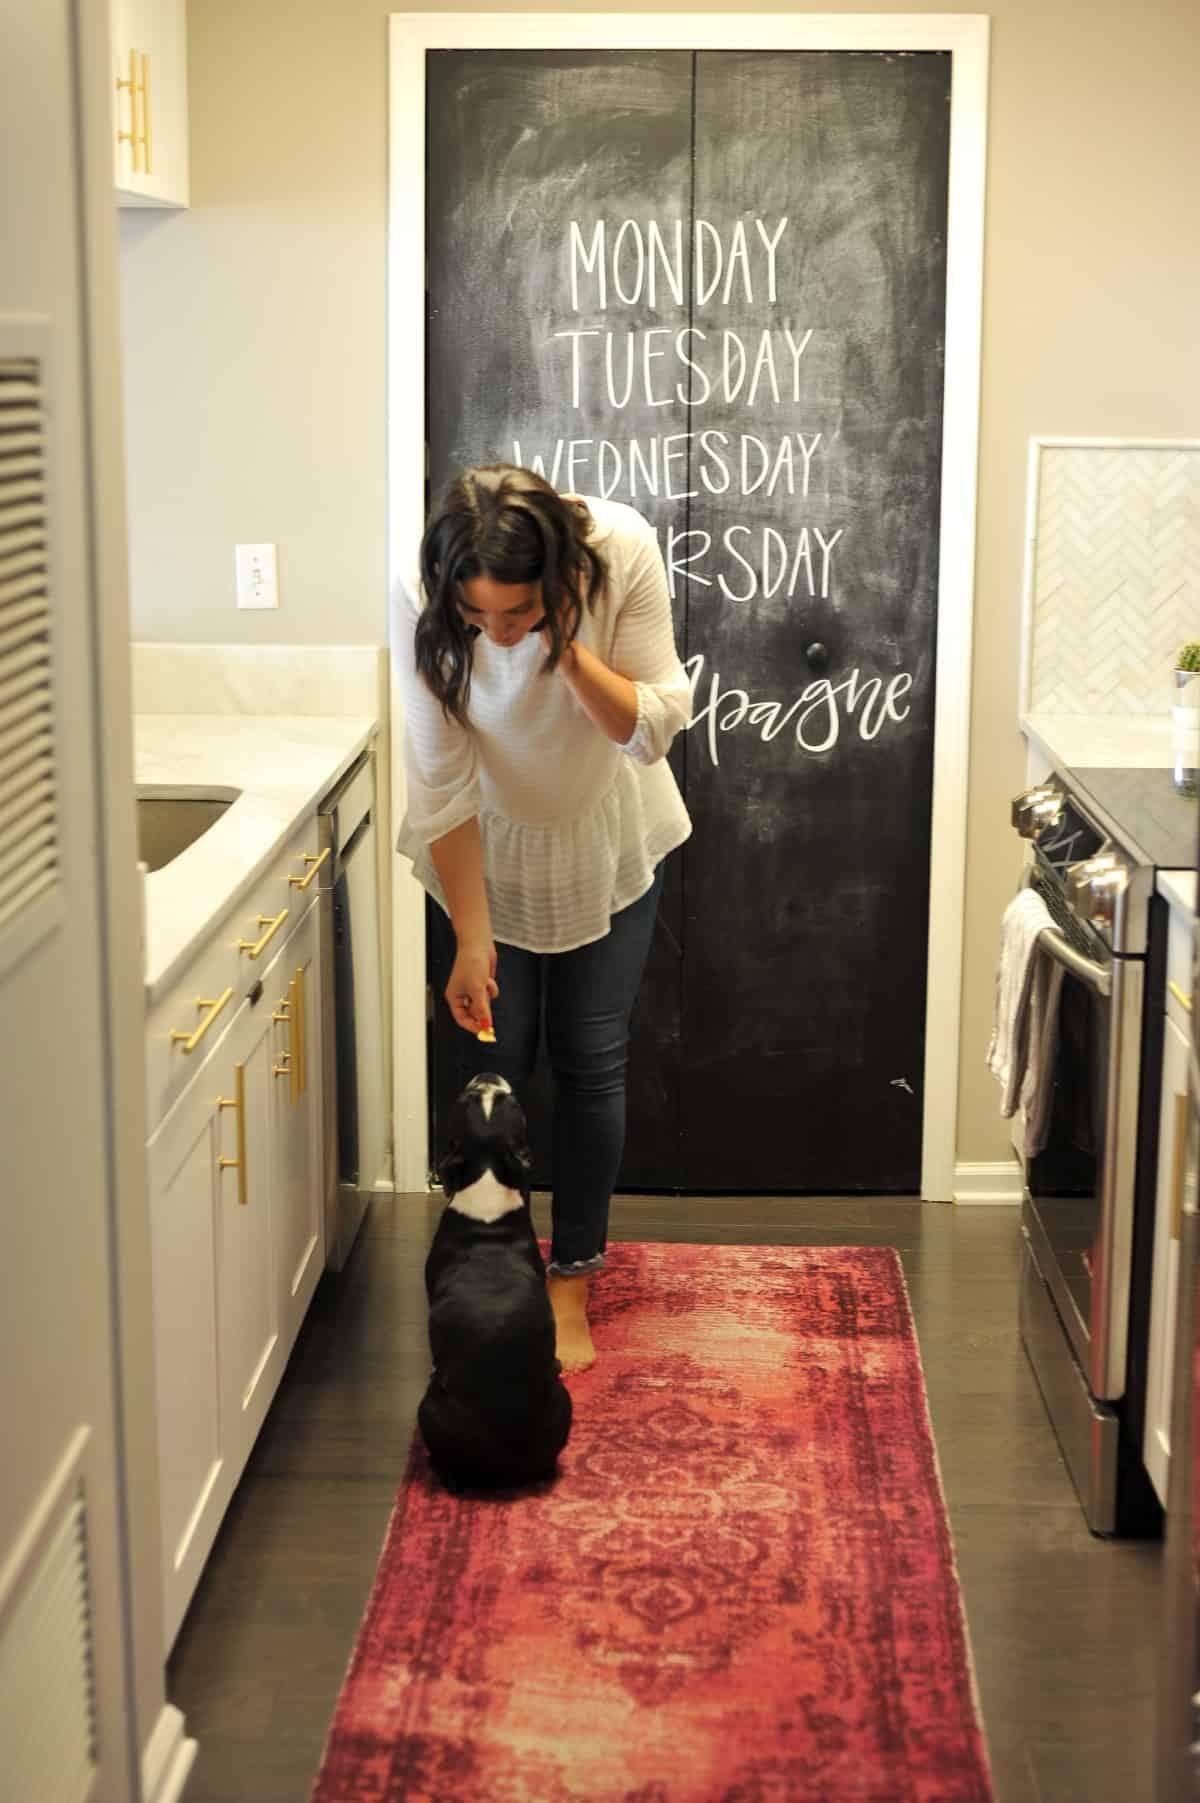 White kitchen ideas, white and brass kitchen, kitchen inspiration - My Style Vita - @mystylevita - 3